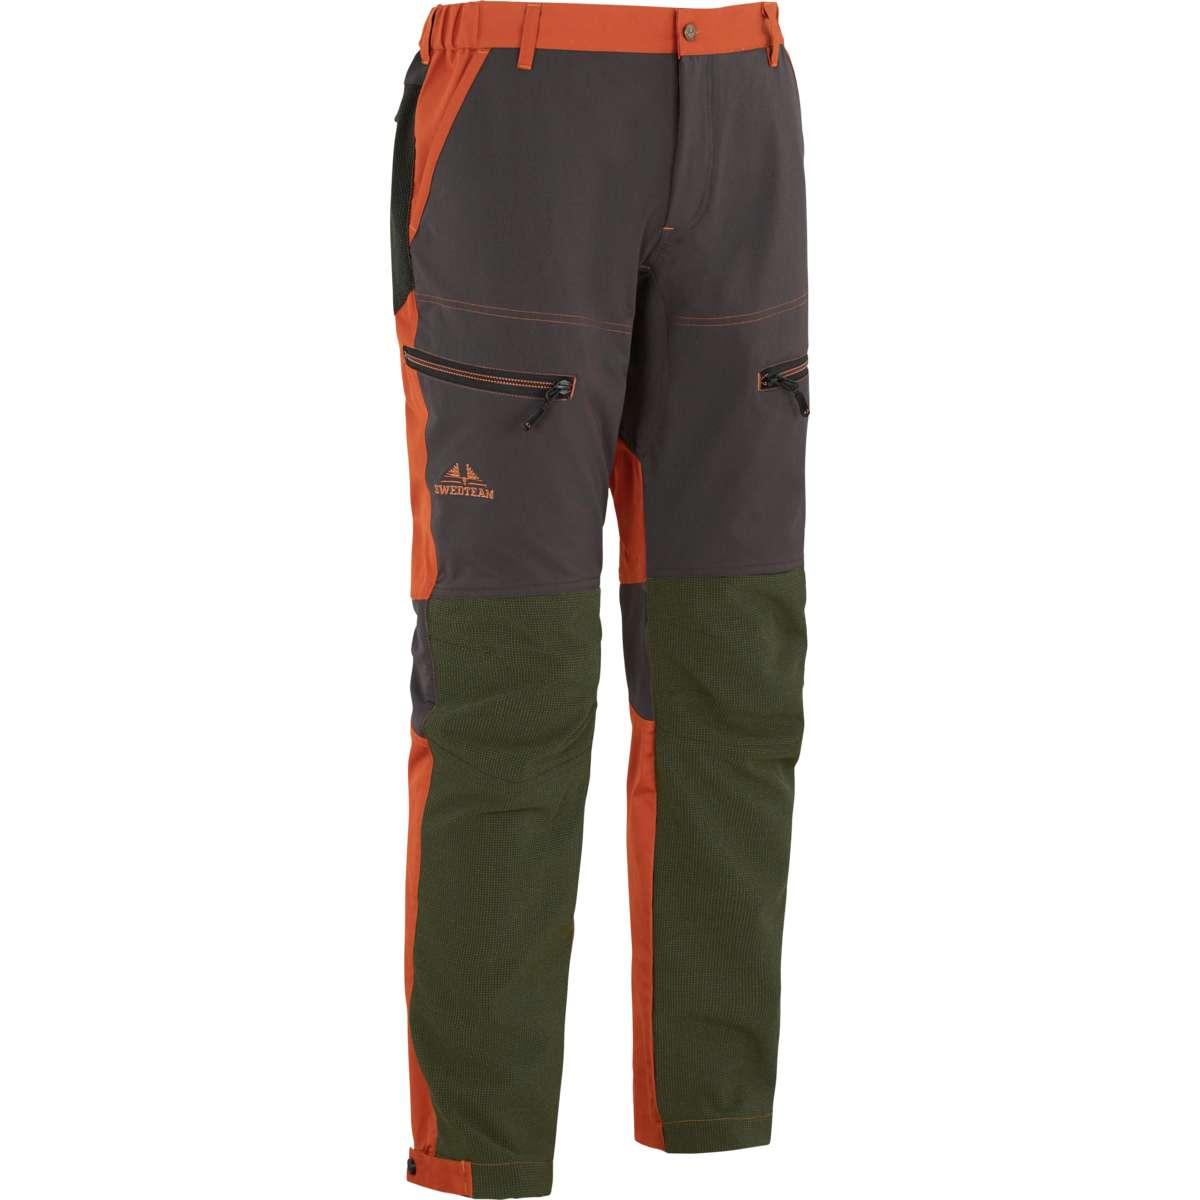 Swedteam Lynx XTREM M Trouser Orange